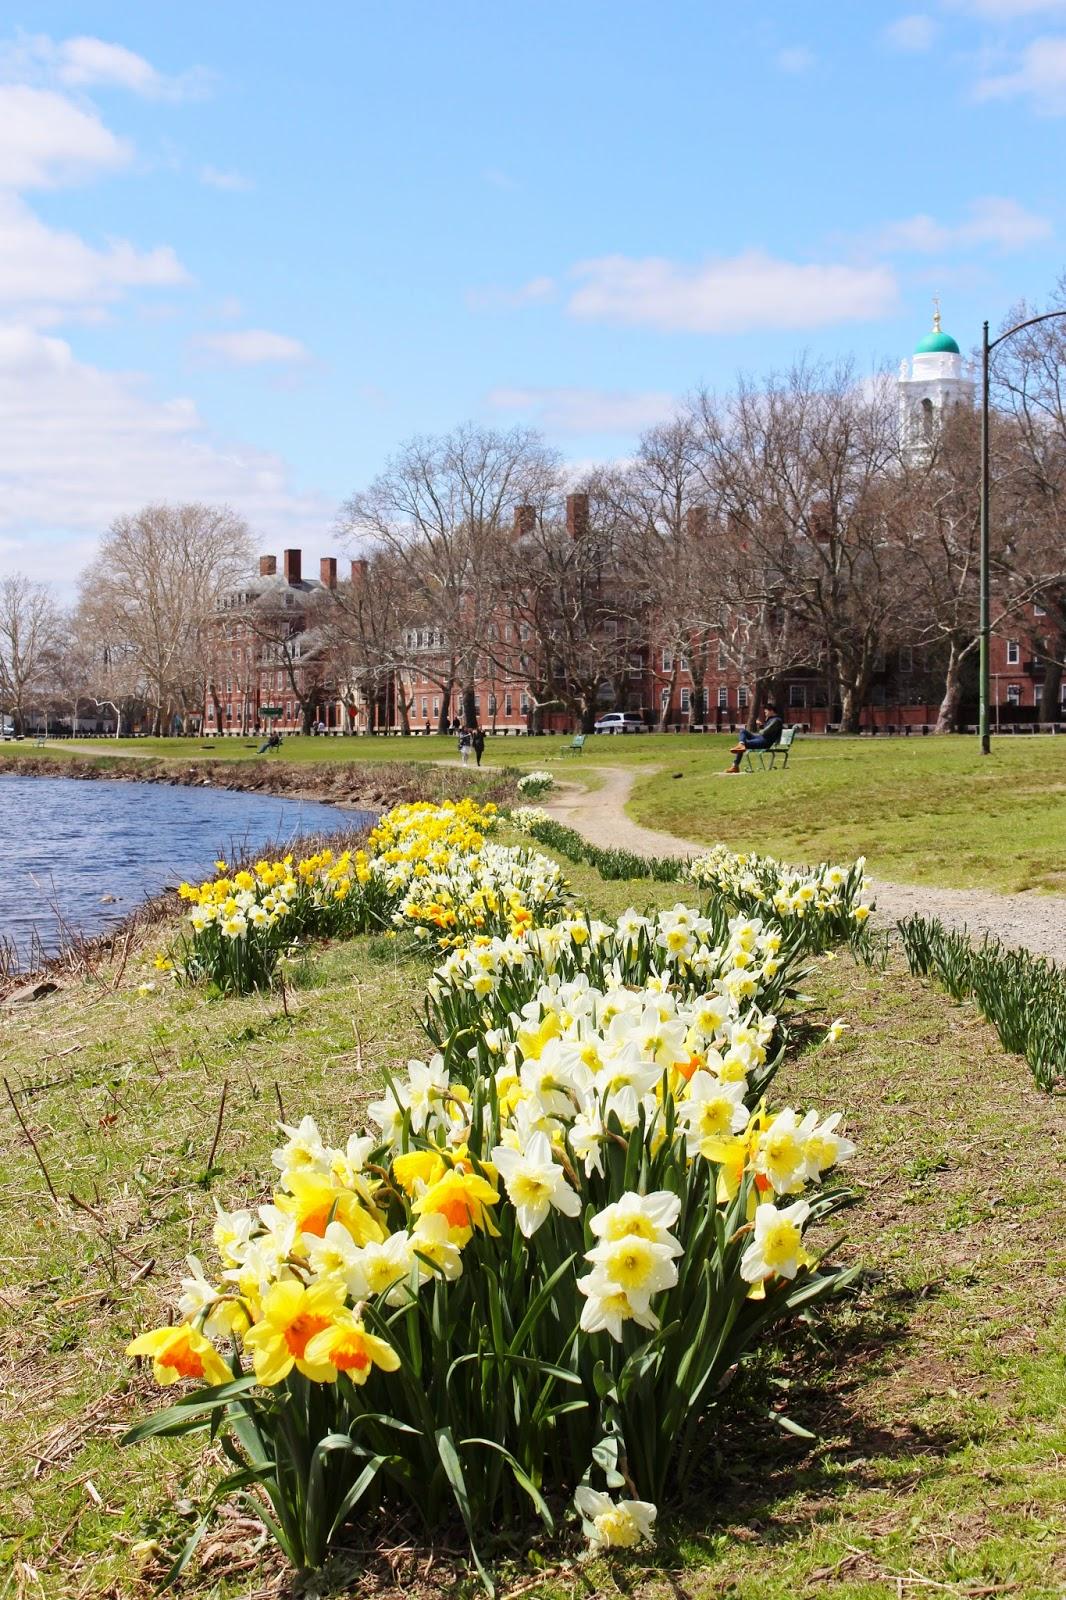 bijuleni - Charles River flowers